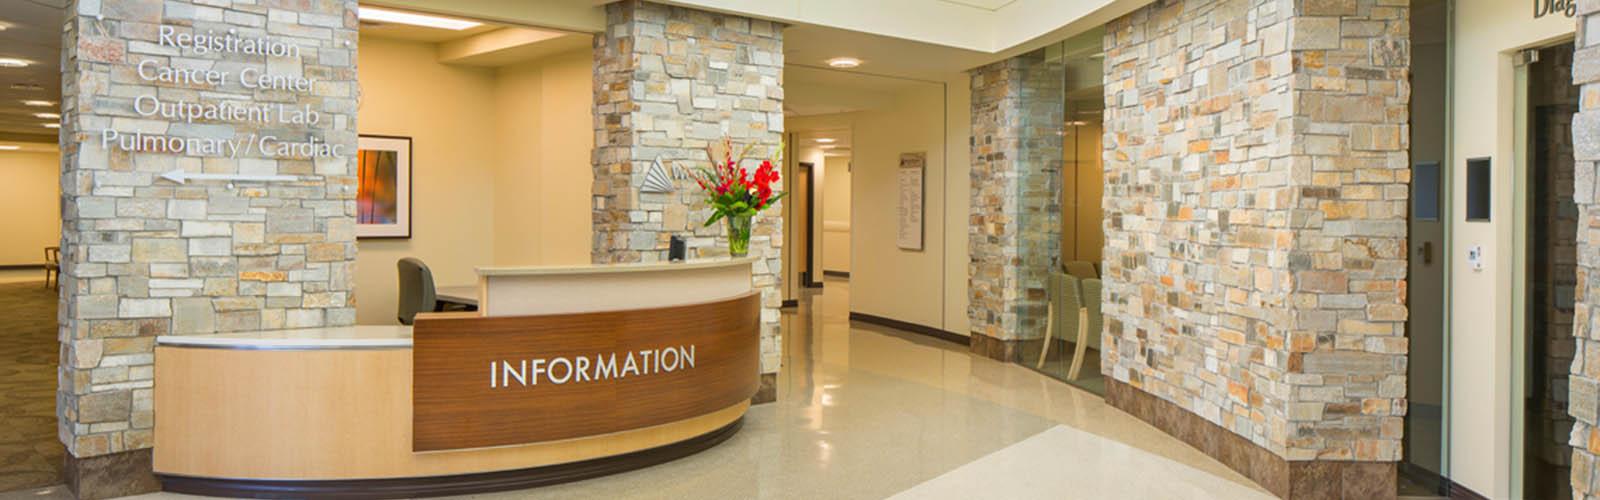 Western Missouri Medical Center Patient Tower 6